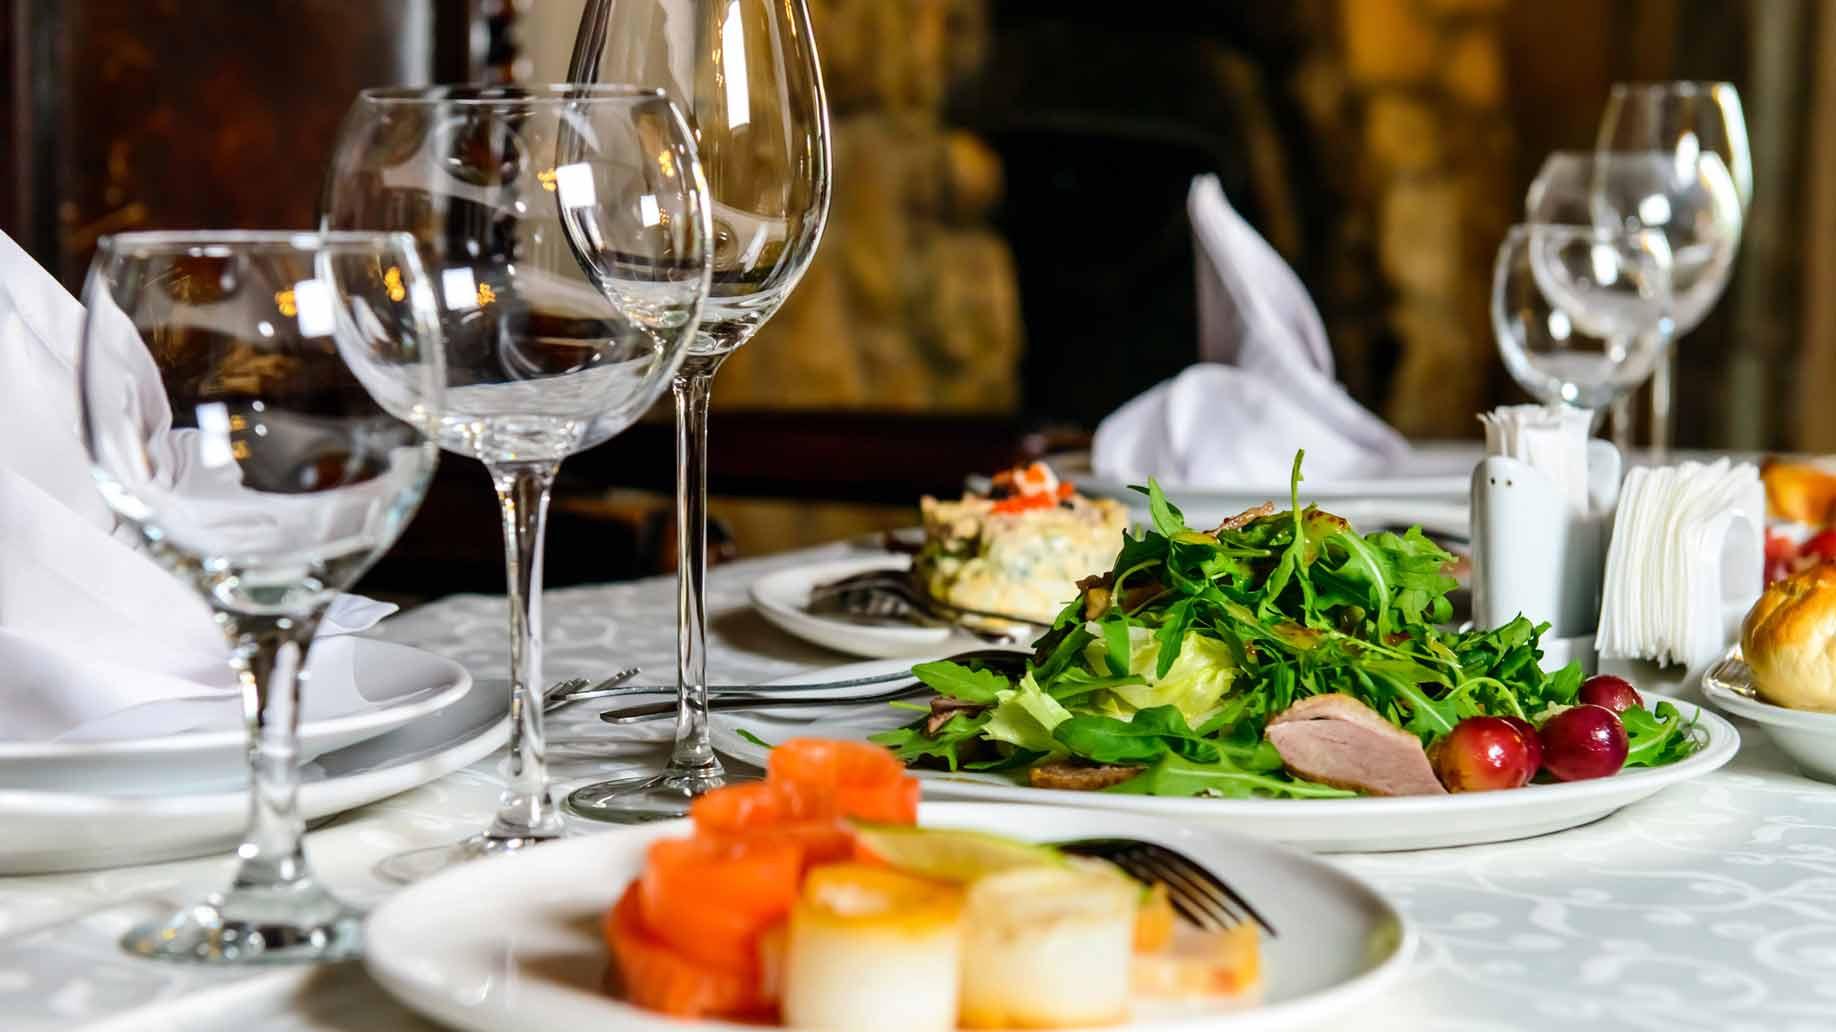 Wedding Dinner Ideas  10 Romantic Wedding Anniversary Ideas For Couples Cheap